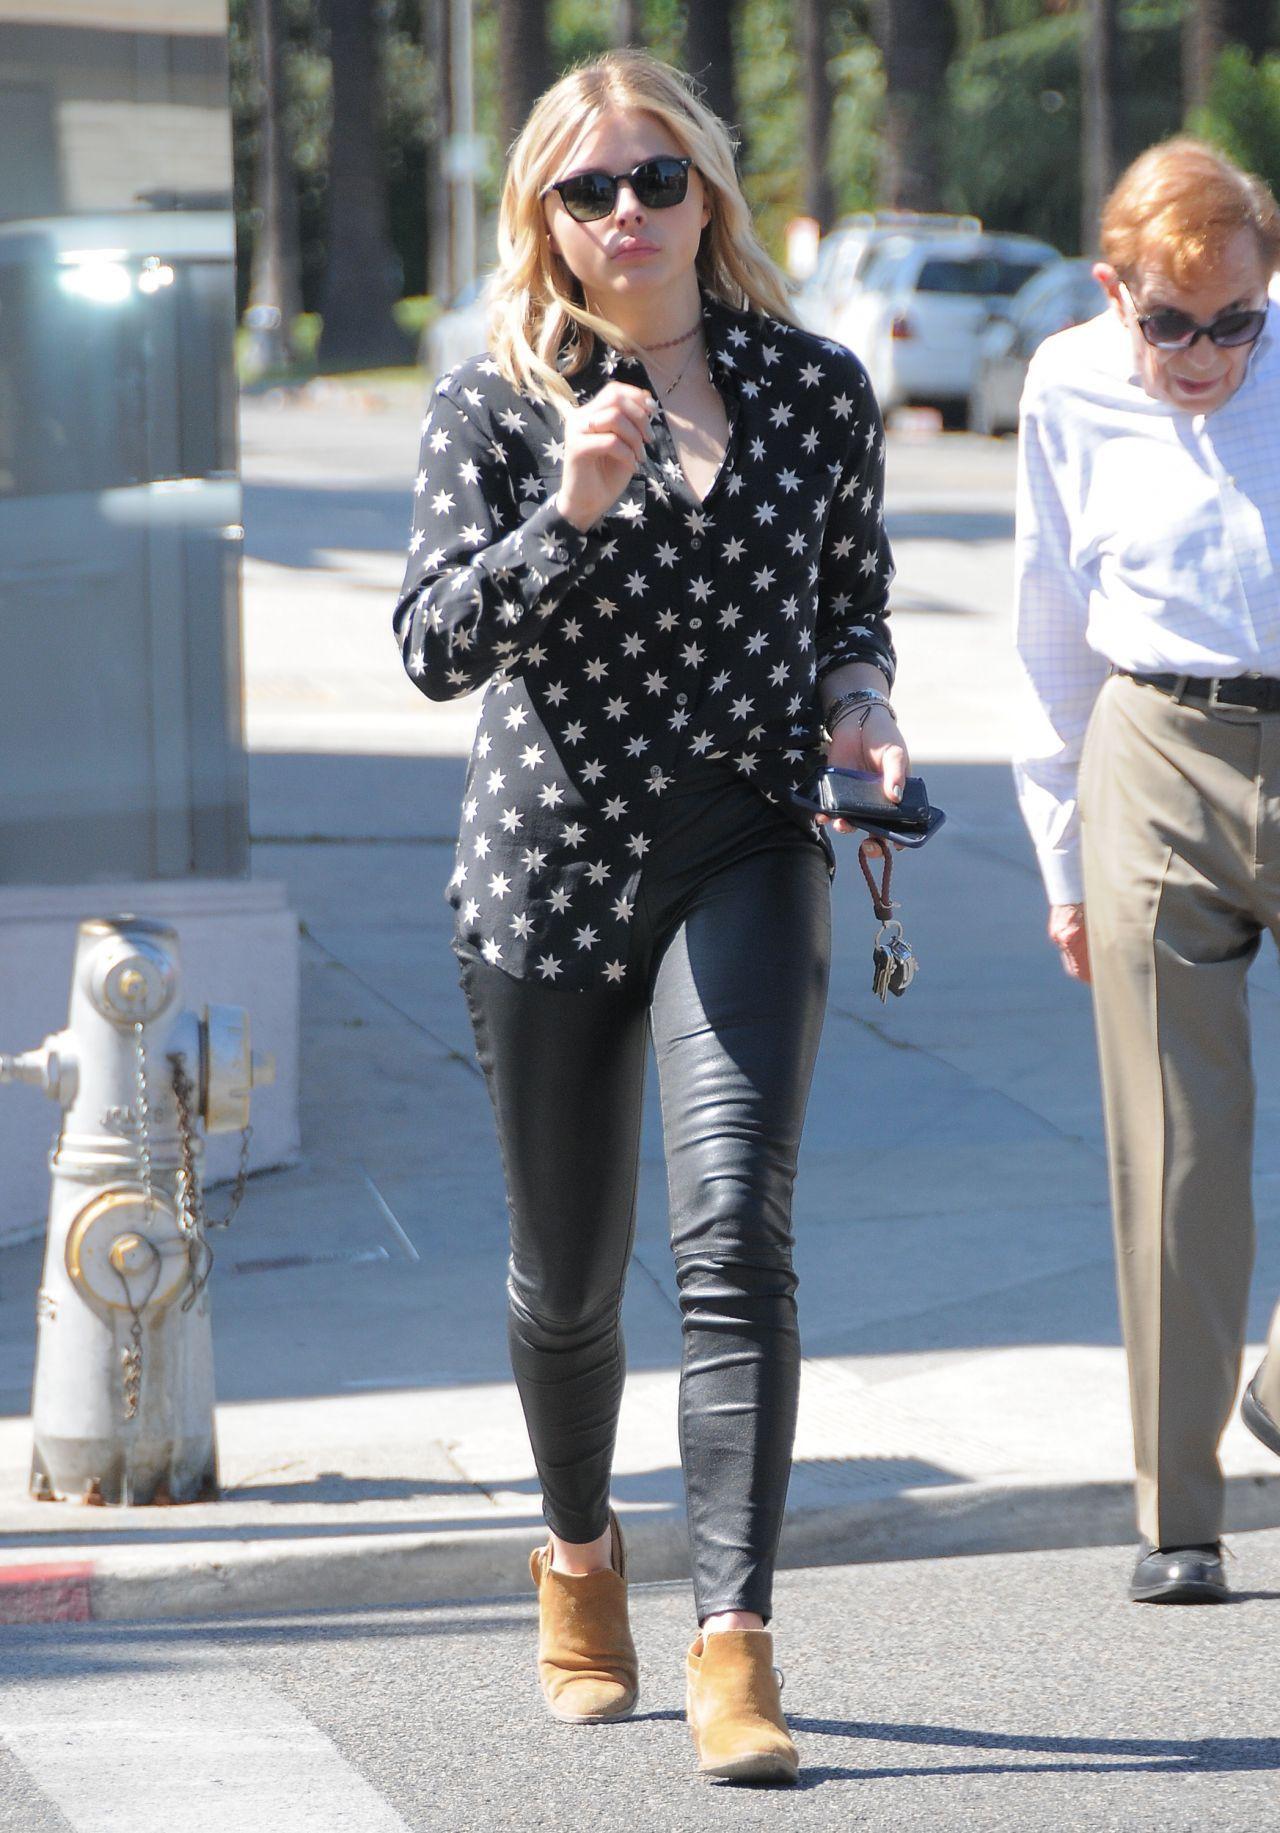 cf80cdc3110c Street style shop celebrity updates chloe grace moretz styles april jpg  1280x1833 Chloe sunglasses celebrities